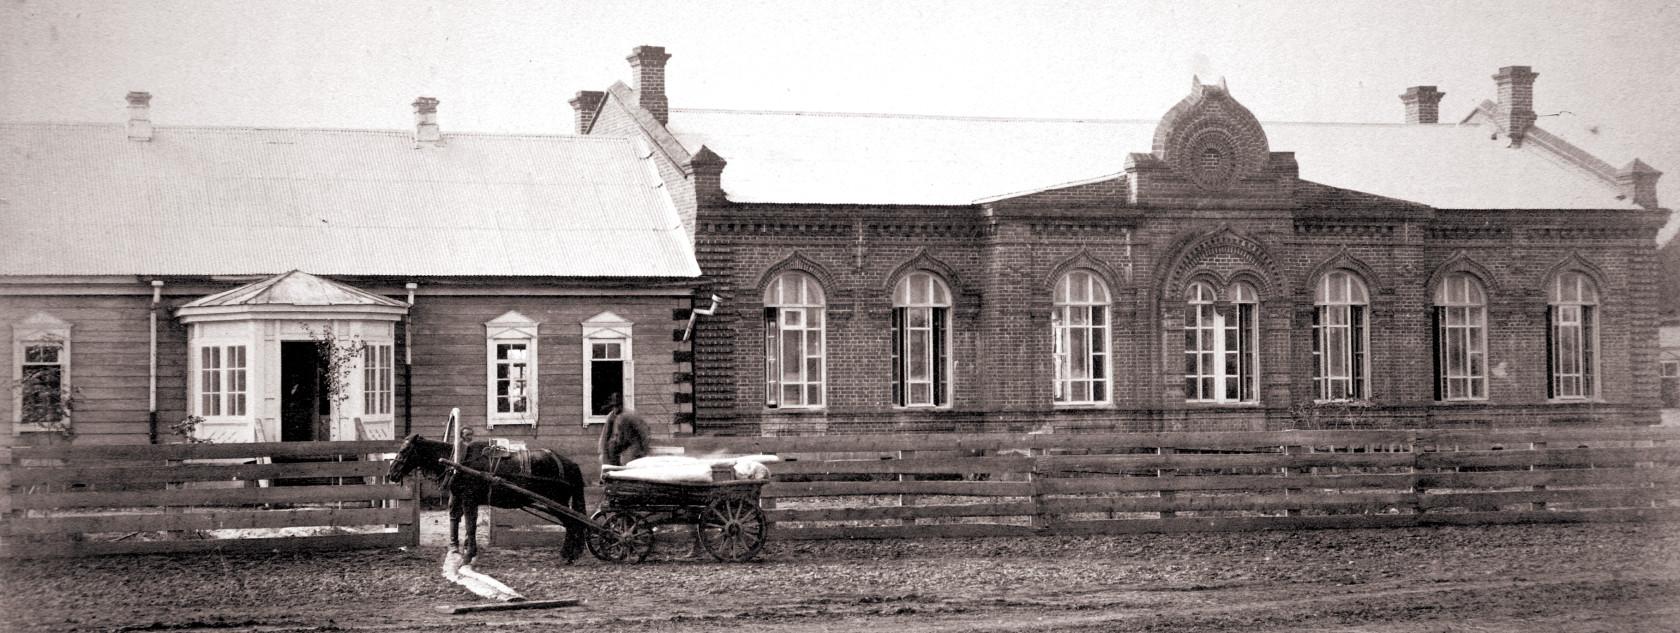 Церковно-приходская школа. 1898